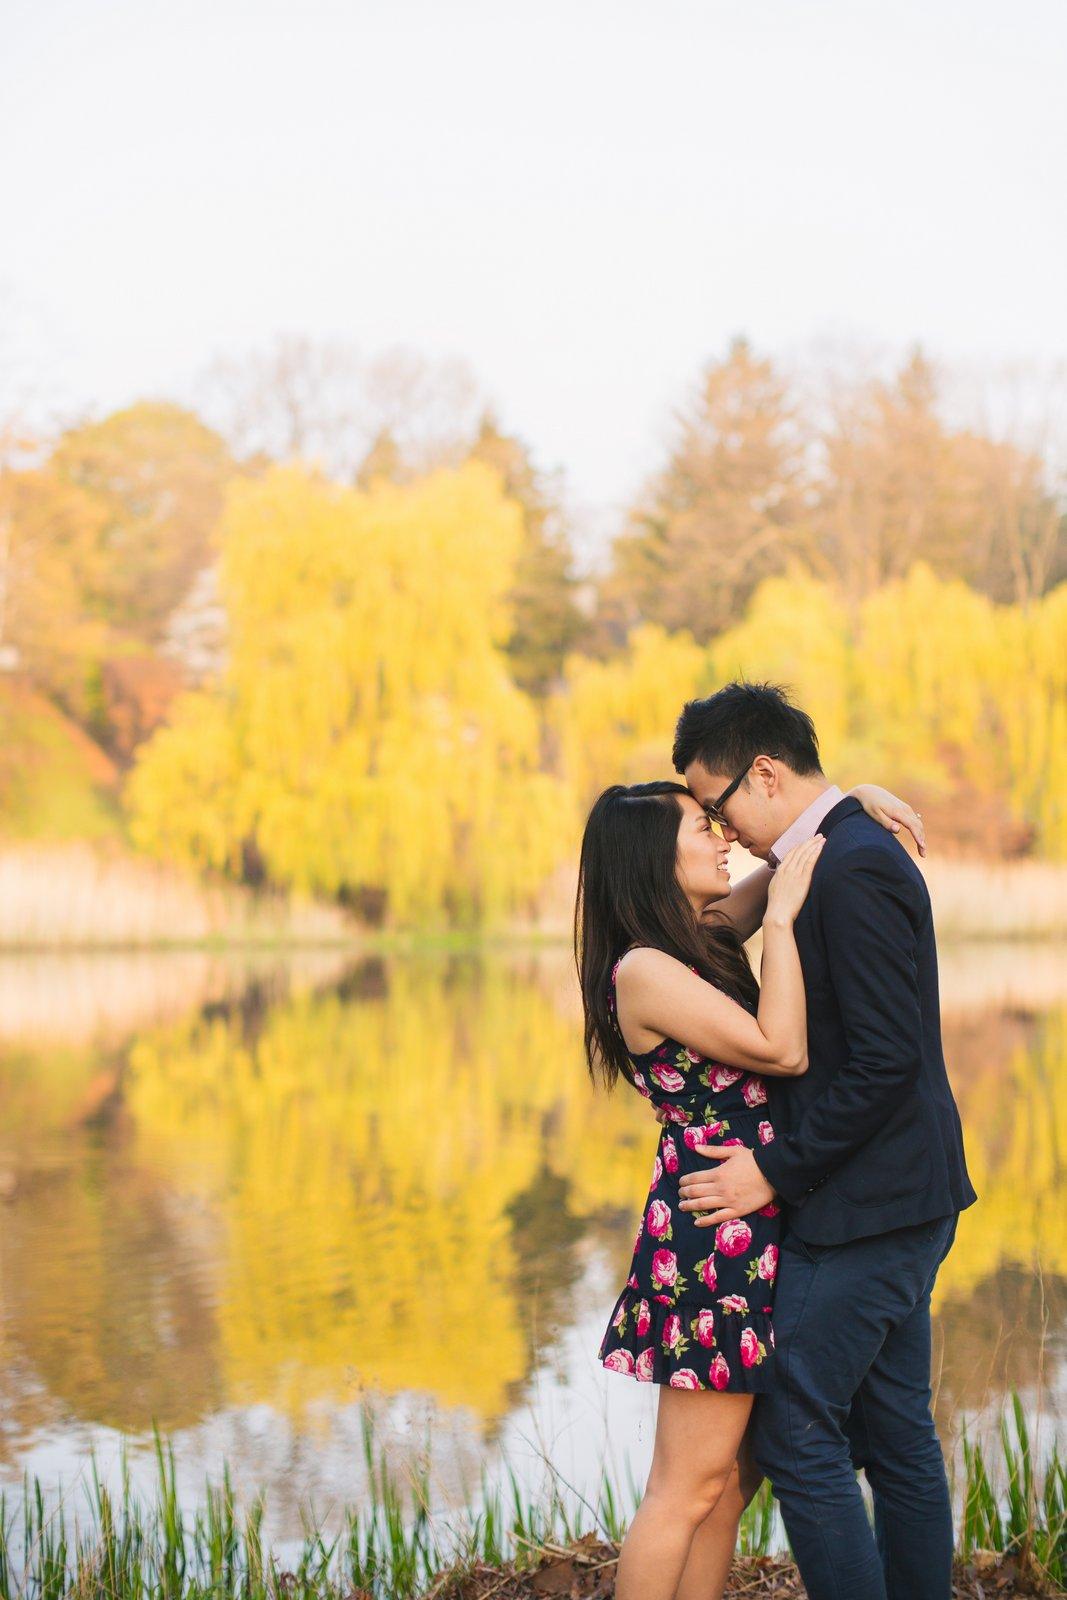 Jessica-Charles-Engagement-High-Park-Cherry-Blossom-007